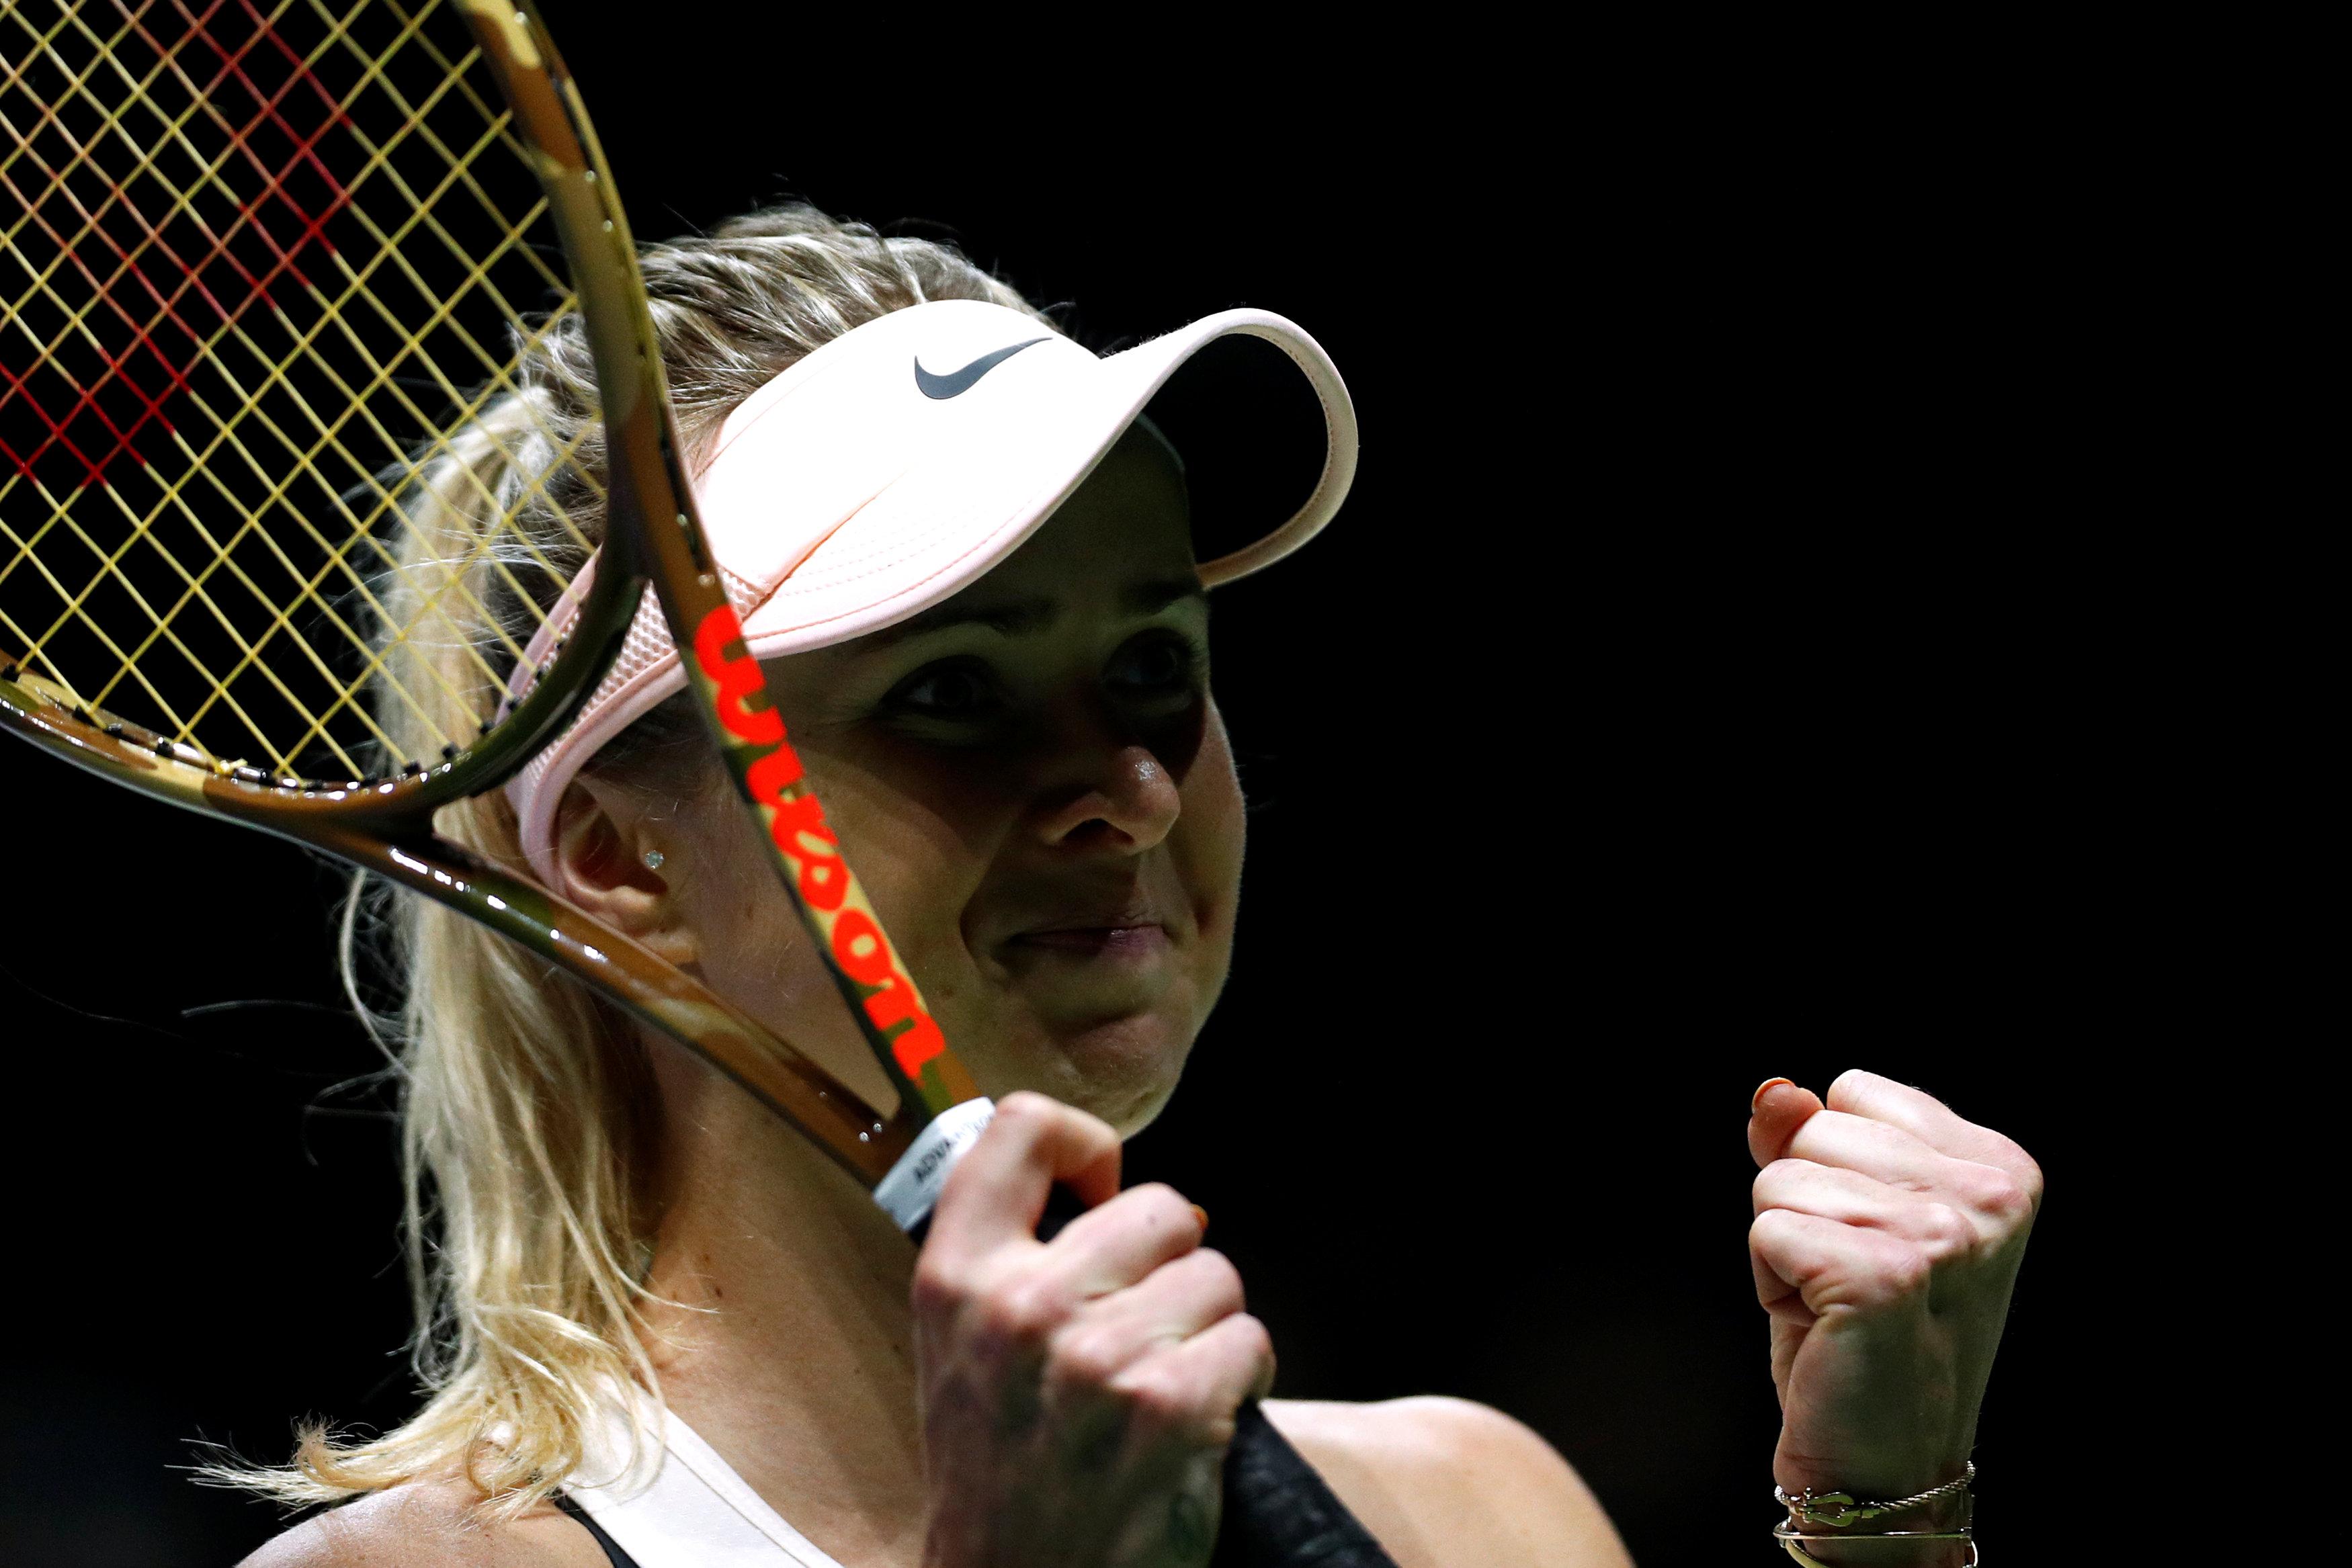 Tennis: Flawless Svitolina eases past Kvitova in Singapore